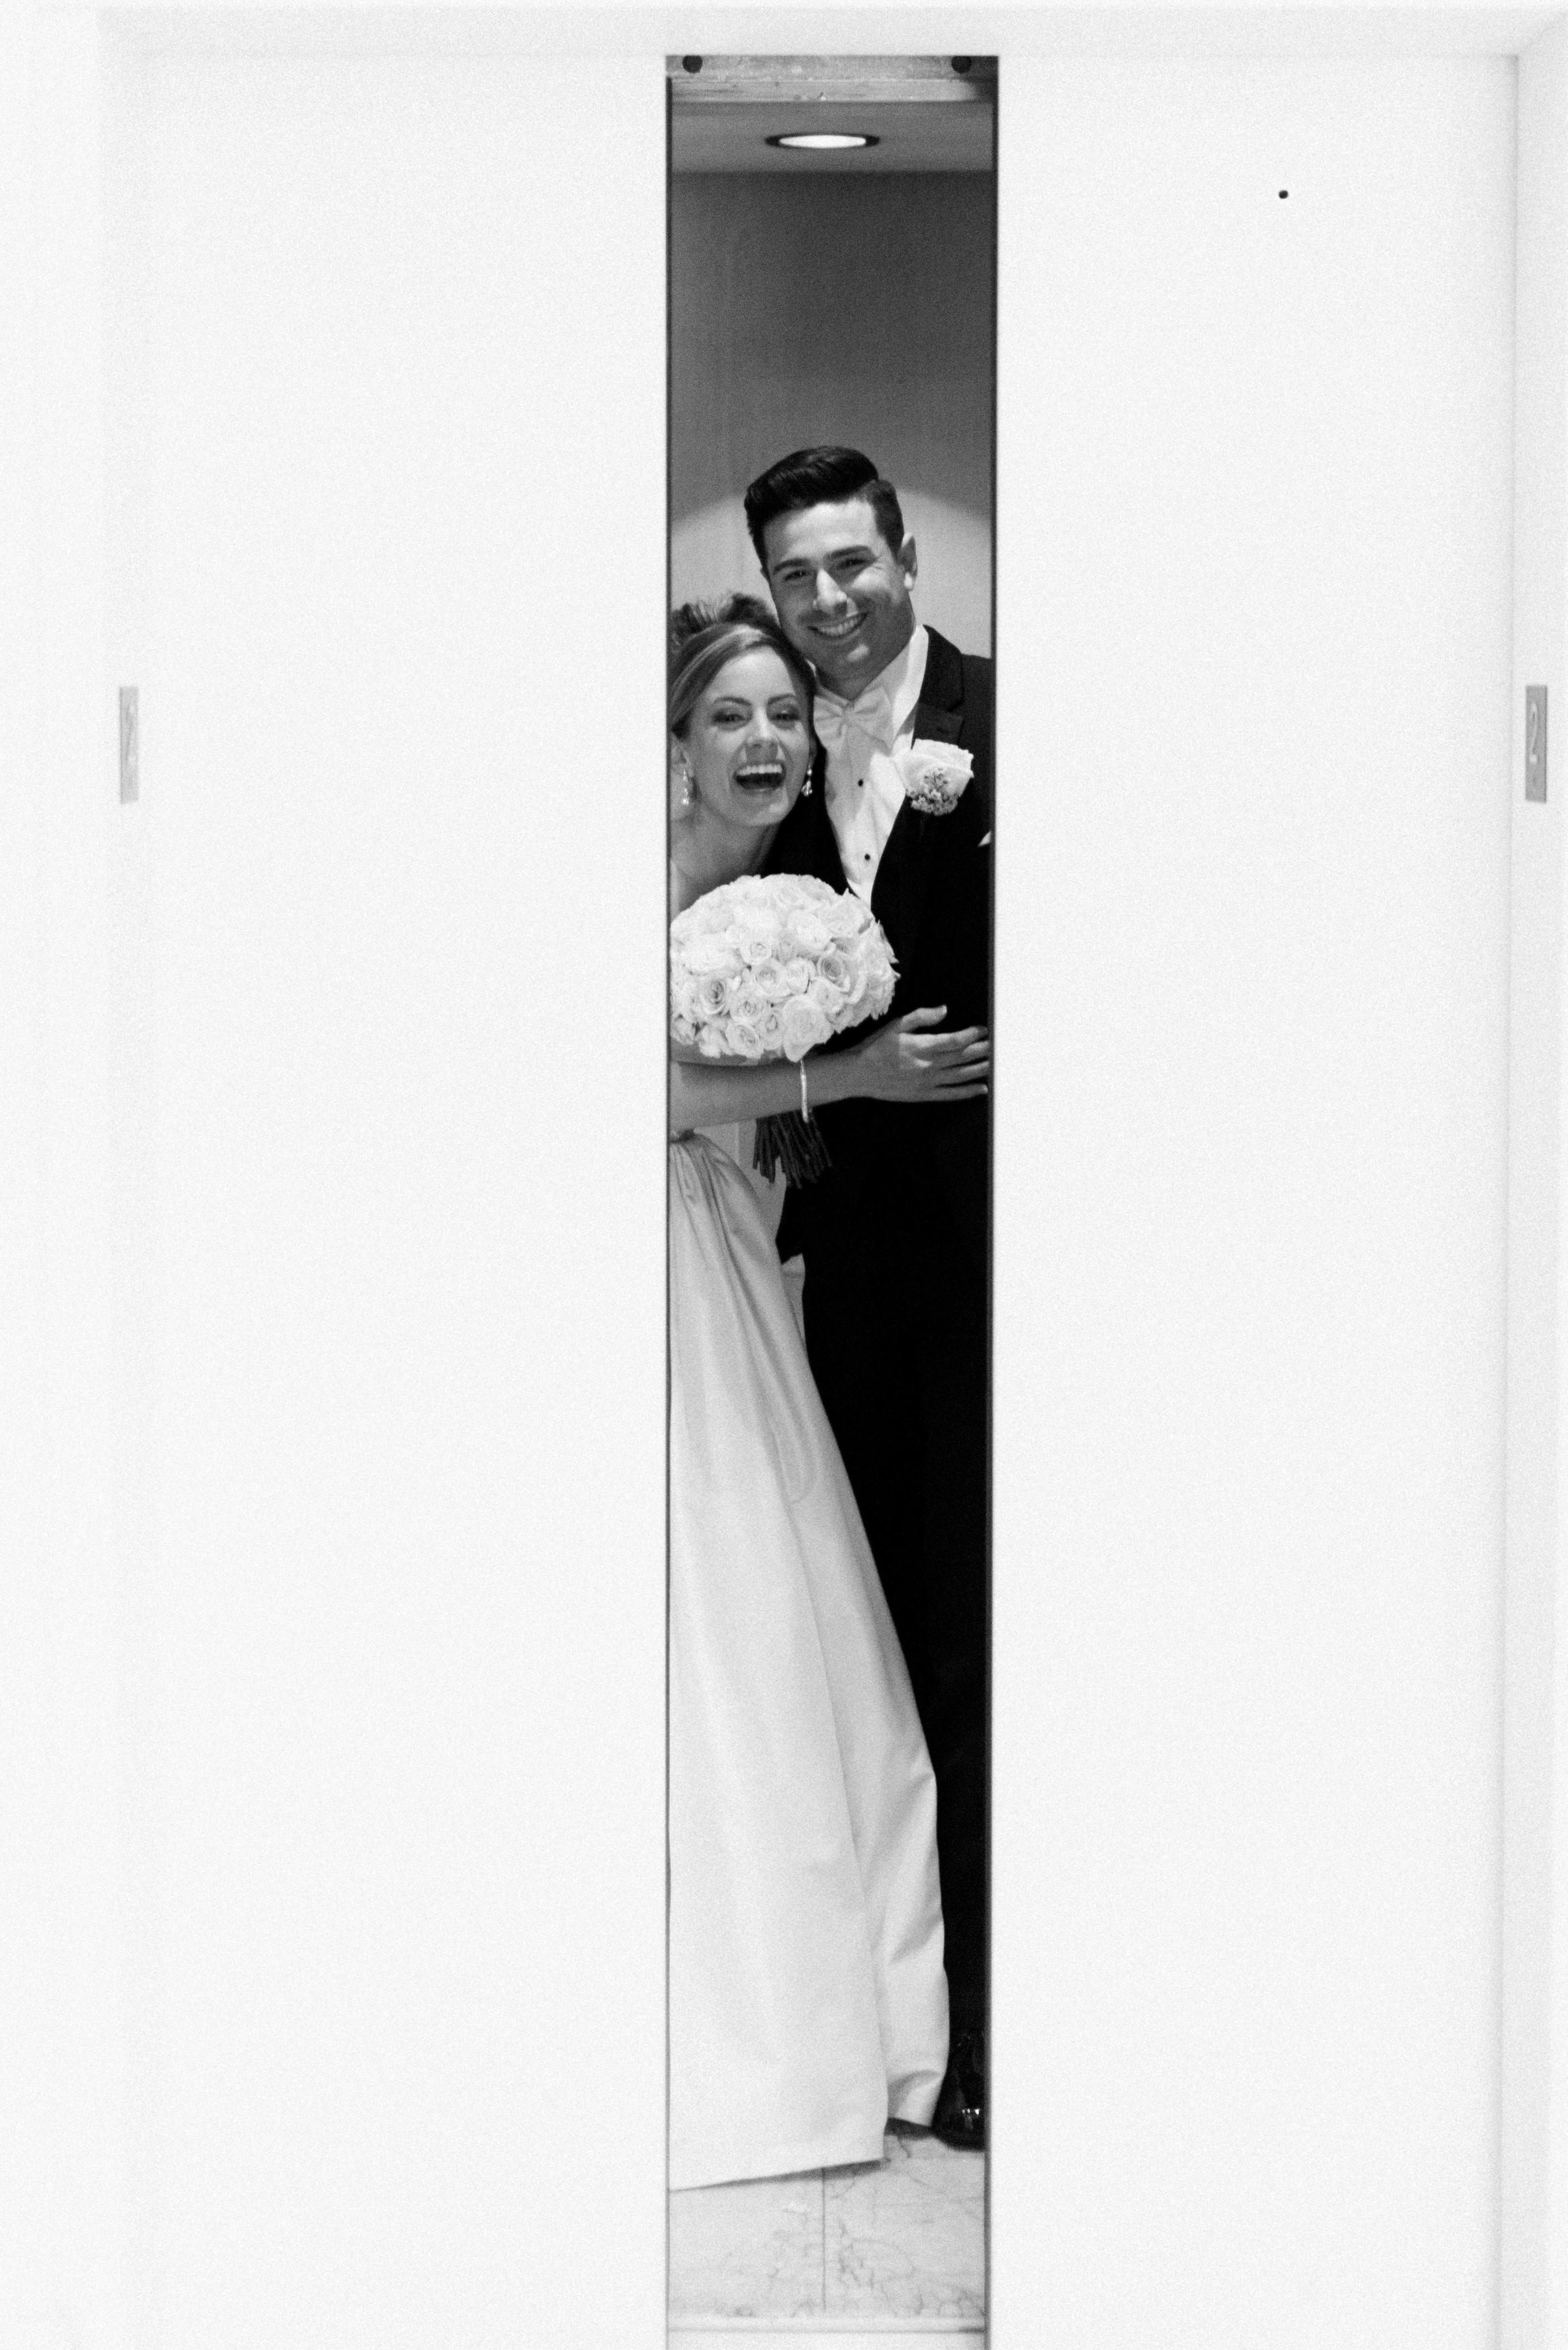 Dana-Fernandez-Photography-Houston-Wedding-Photographer-Style-Me-Pretty-Film-Texas-Destination-Photographer-17.jpg